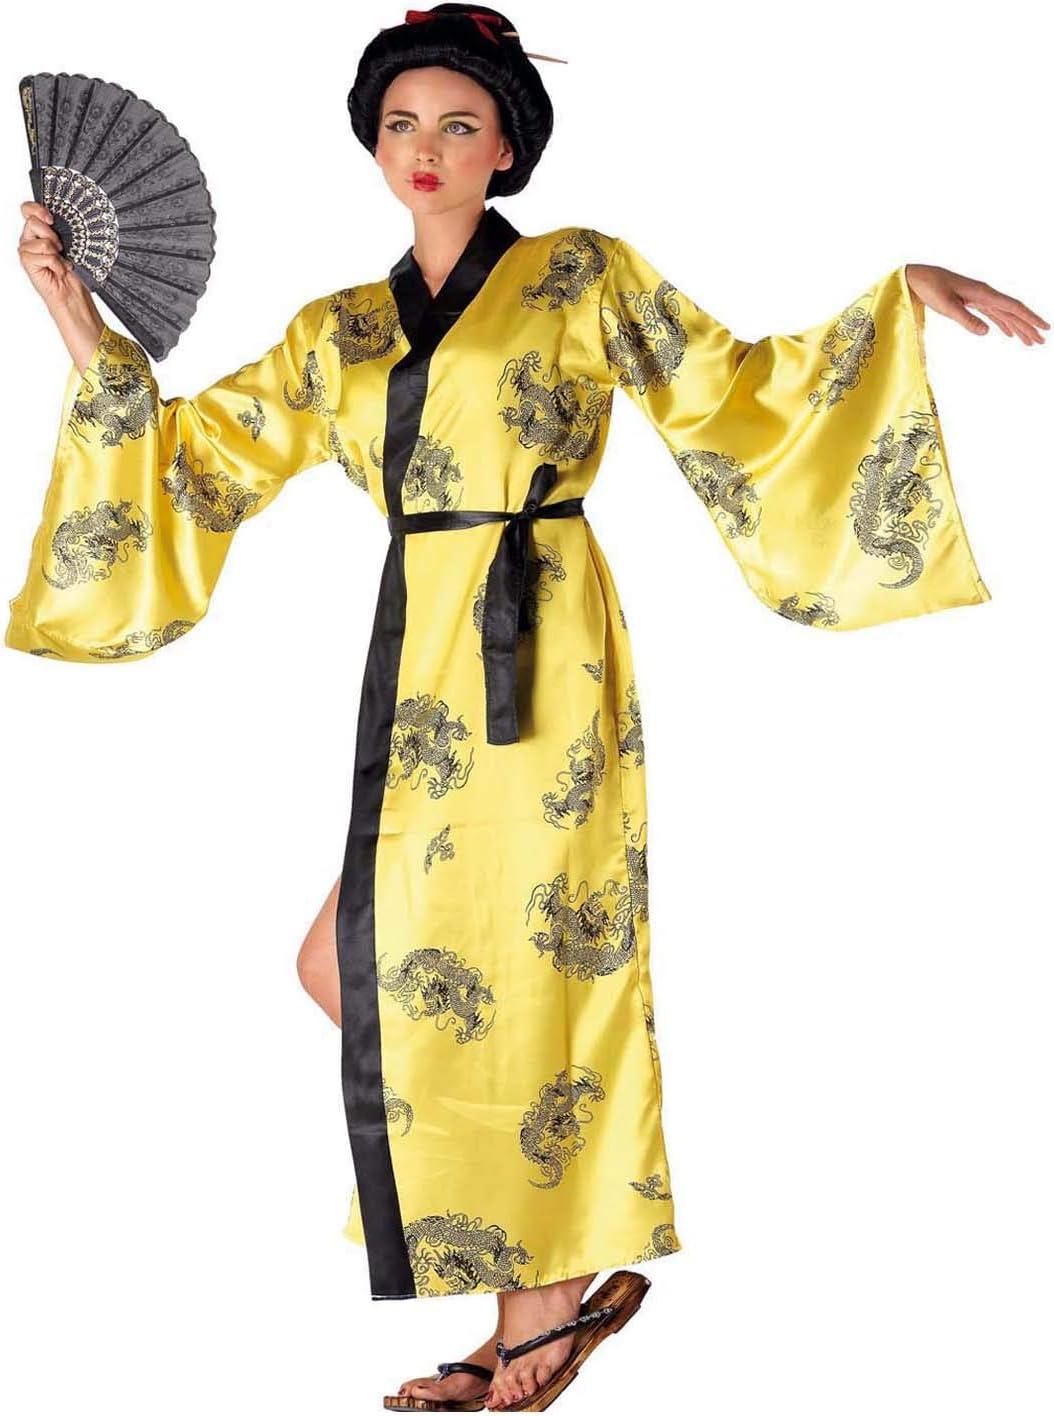 chiber Disfraces Disfraz Mujer China Amarillo: Amazon.es: Juguetes ...